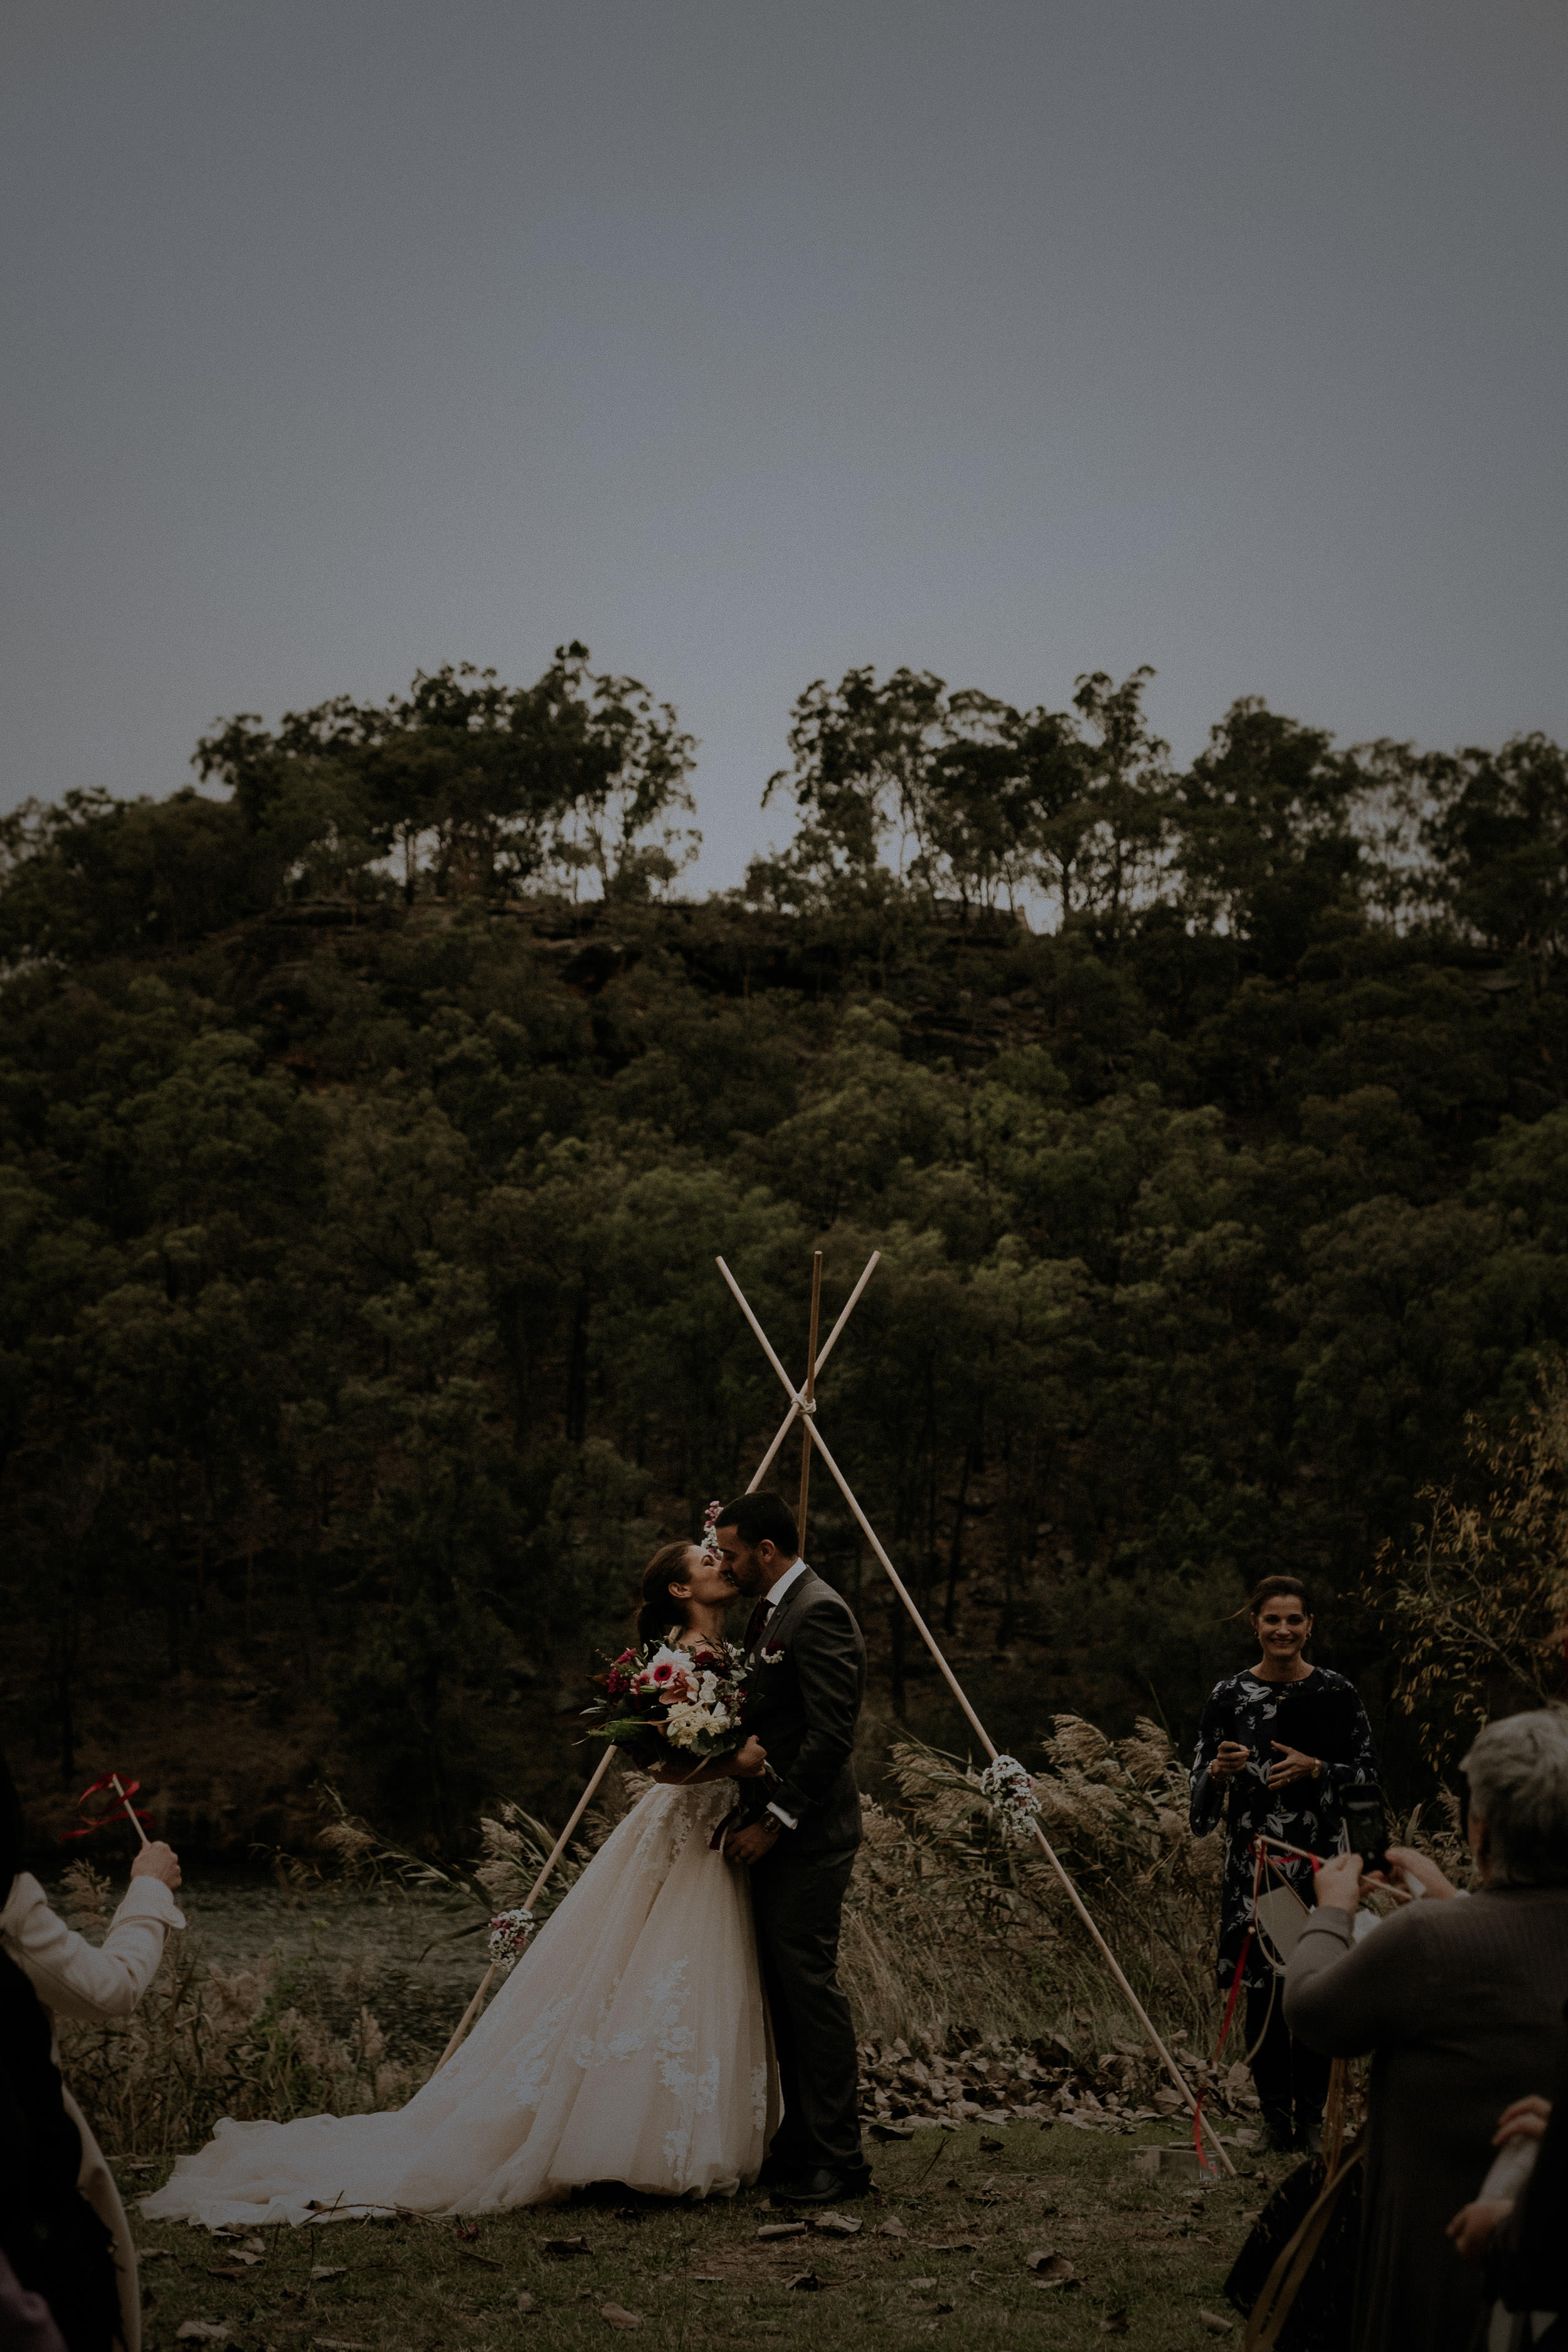 g_c wedding - kings _ thieves elopement wedding photography - blog 51.jpg